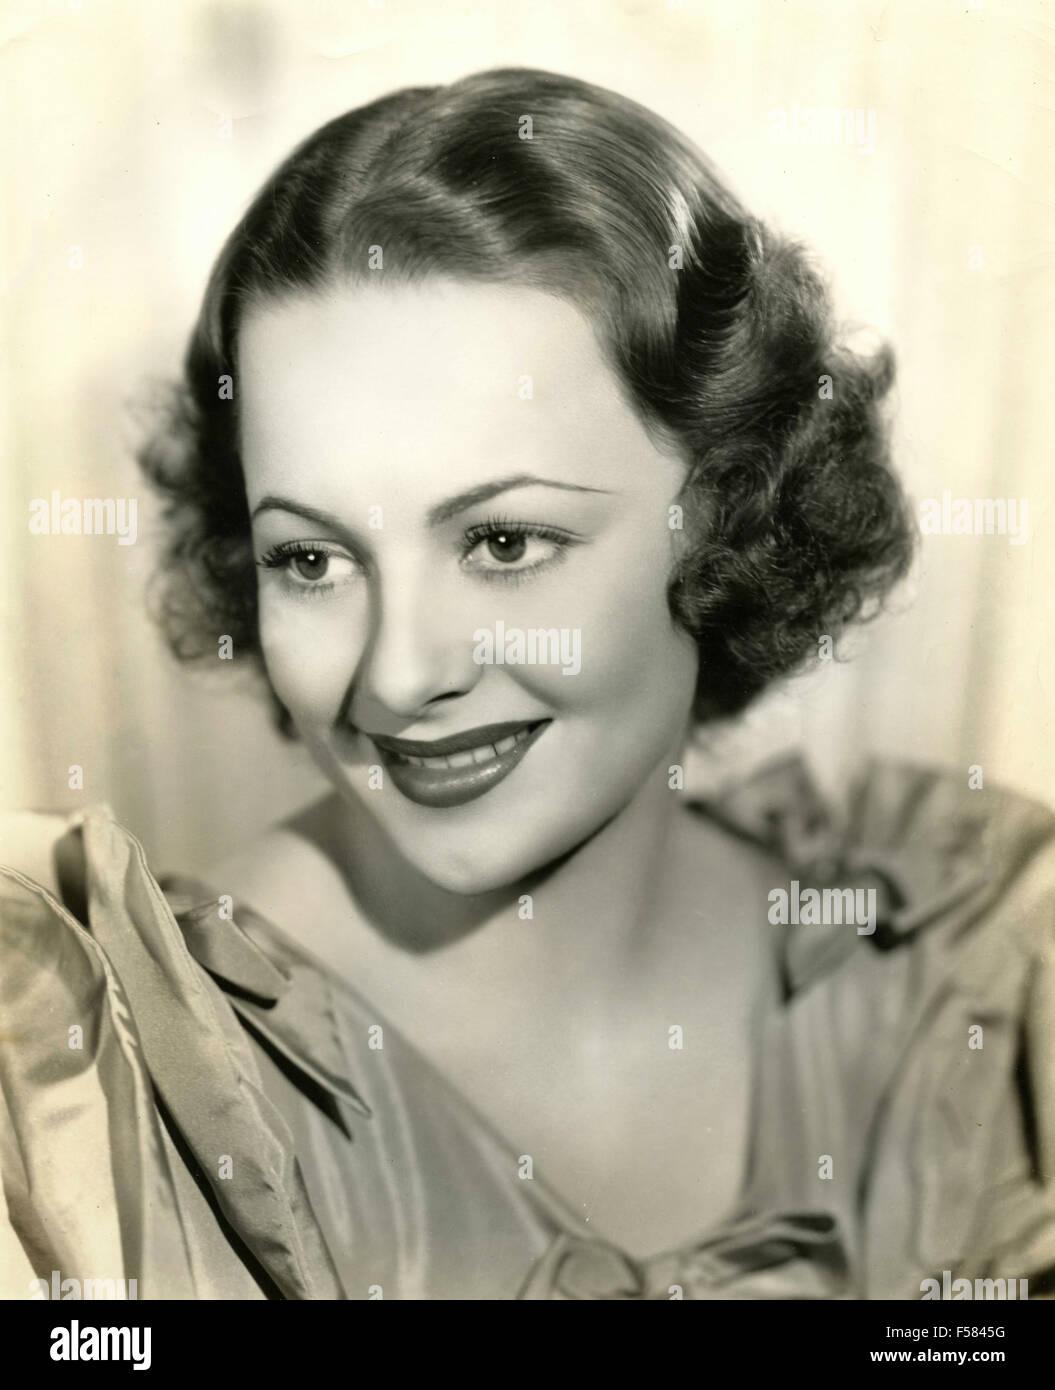 The American actress Olivia De Havilland - Stock Image